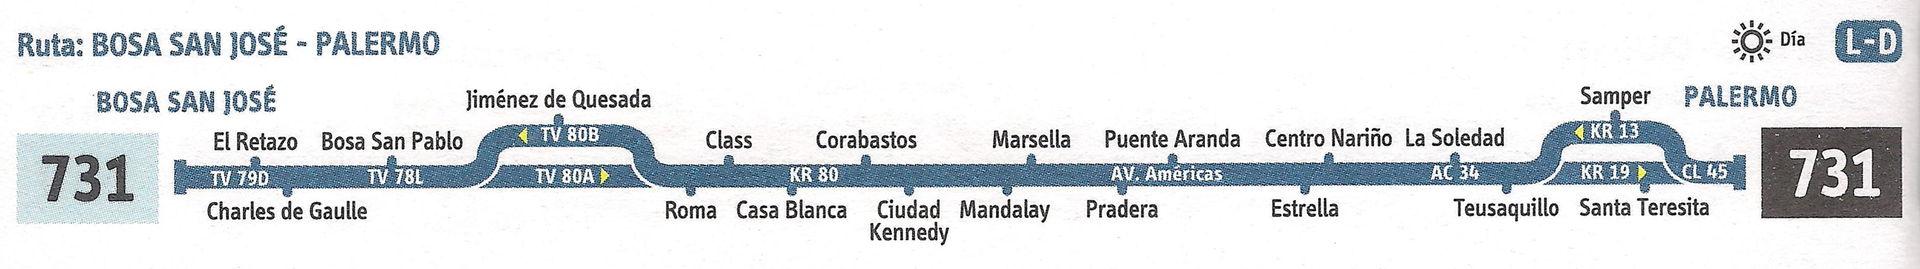 Ruta SITP: 731 Bosa, San José ↔ Palermo [Urbana] 1